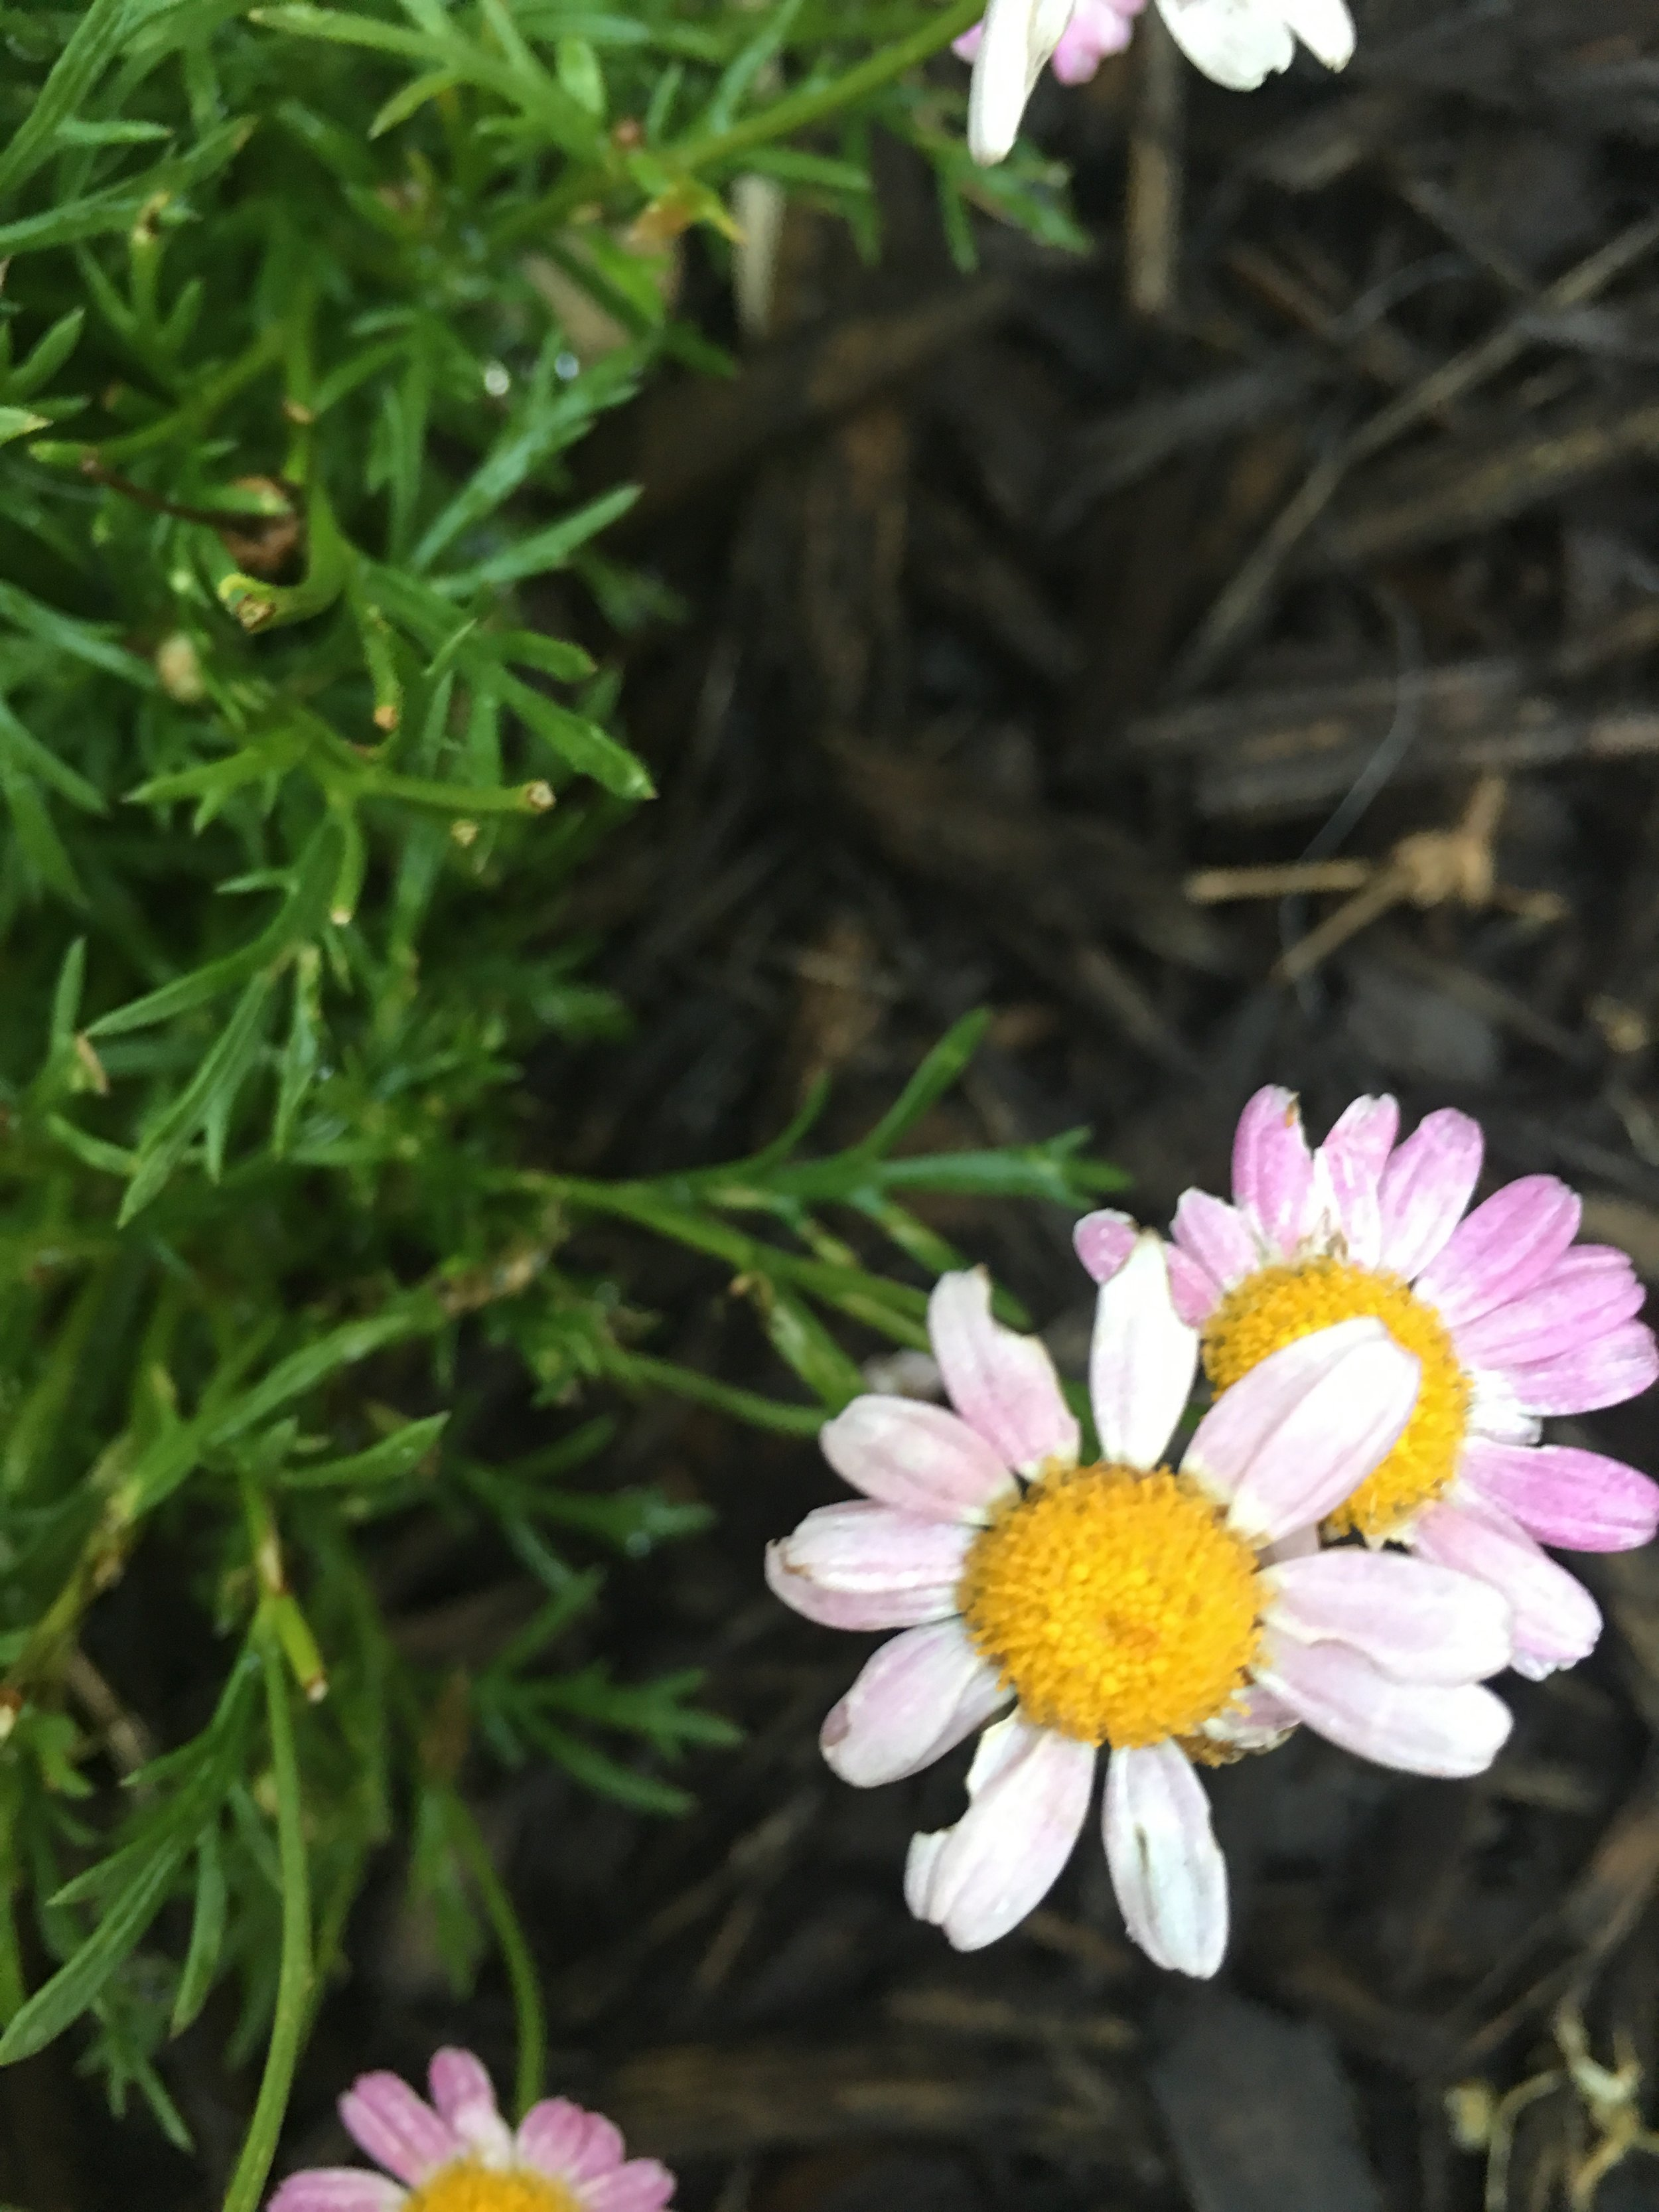 Hurd & Honey - Marguerite Daisy Zones 9-11